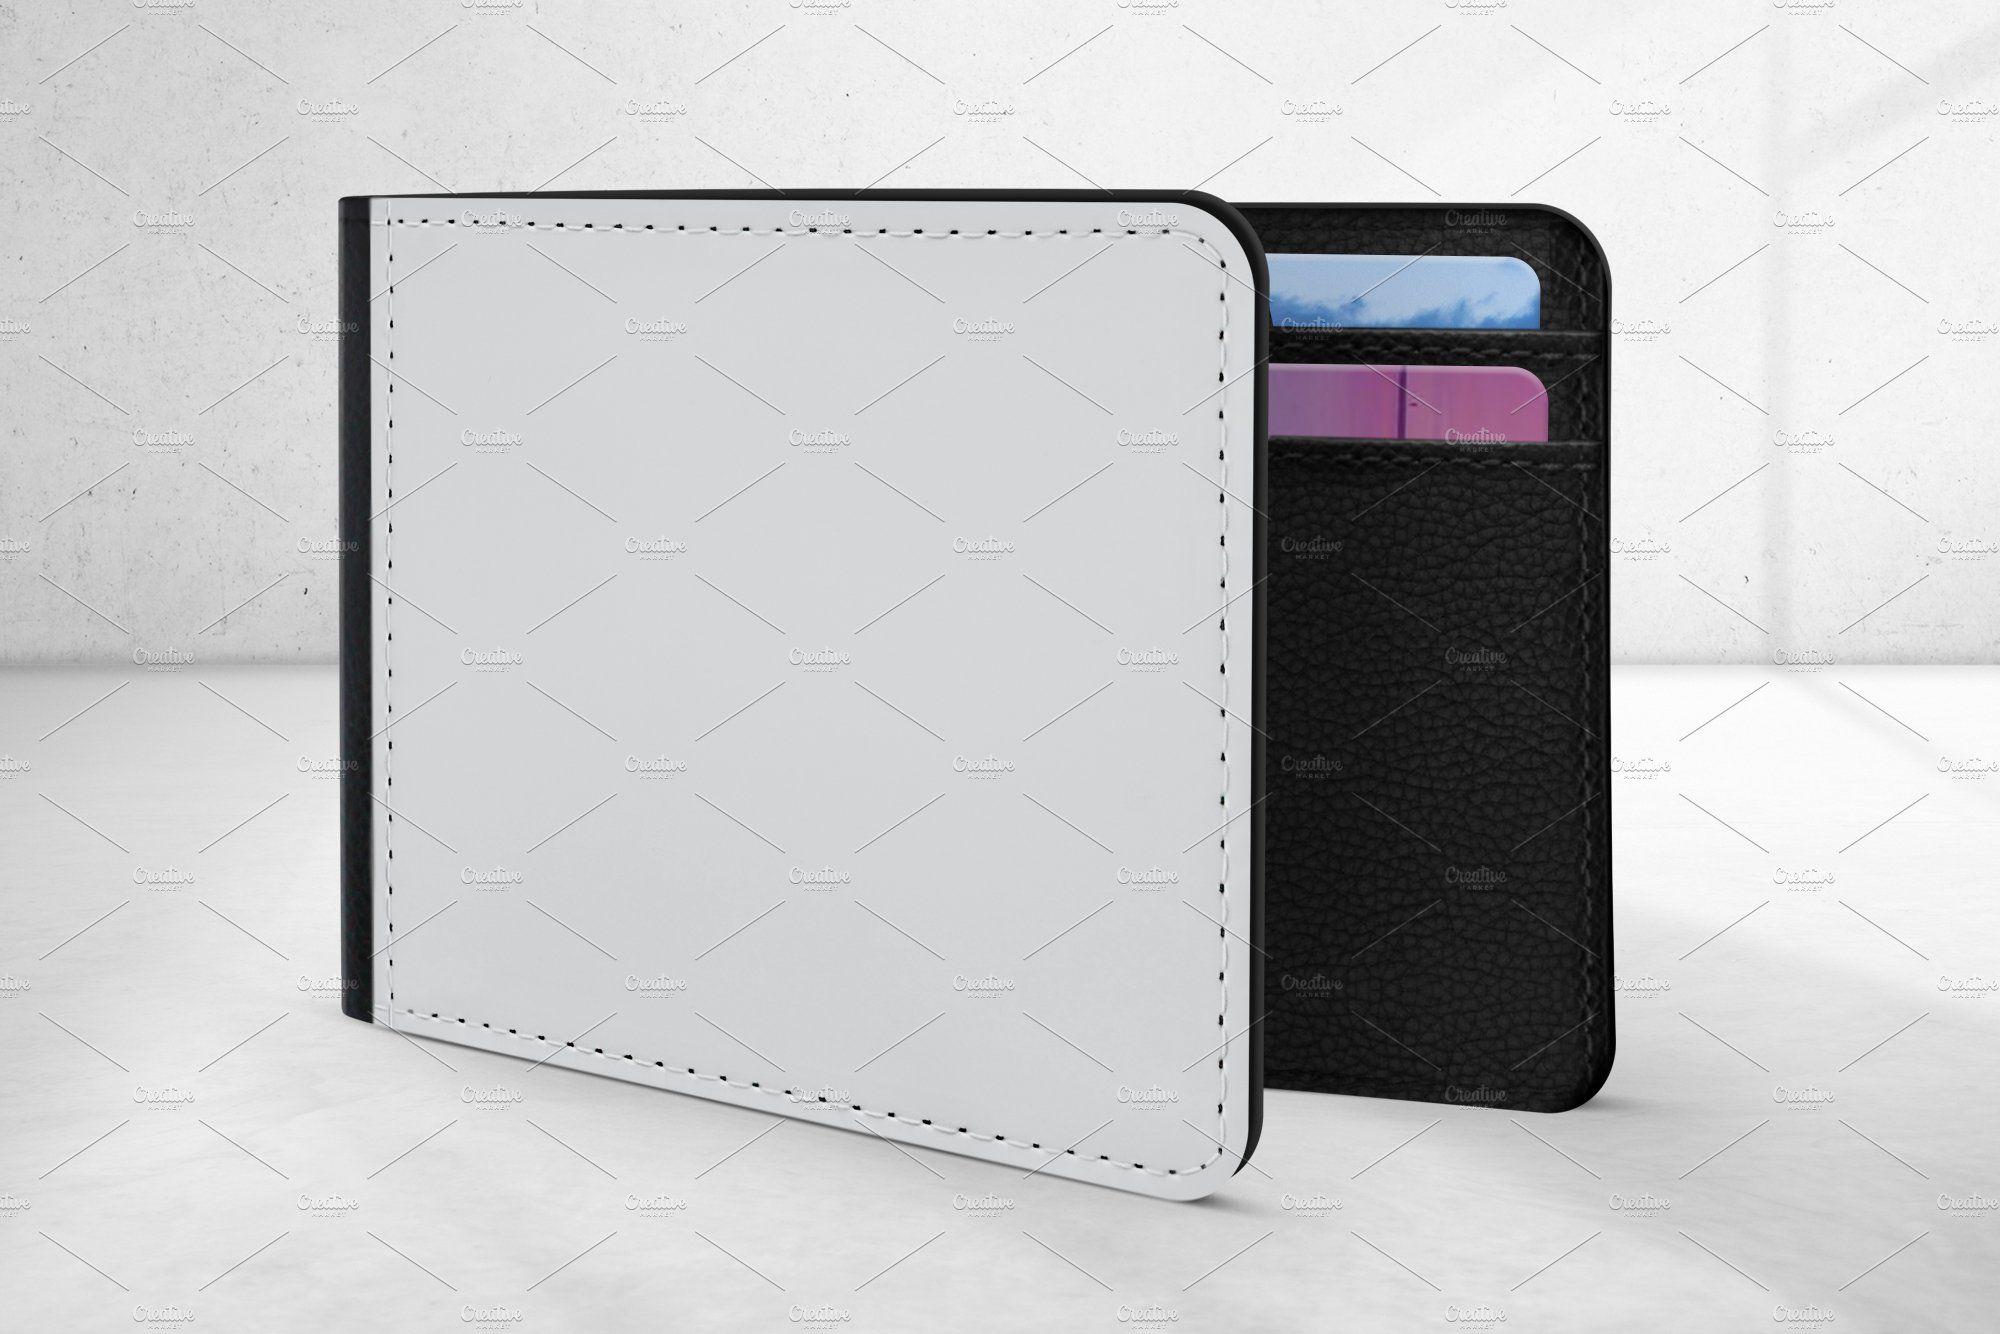 Men S Wallet Mockup In 2021 Wallet Men Wallet Design Graphique